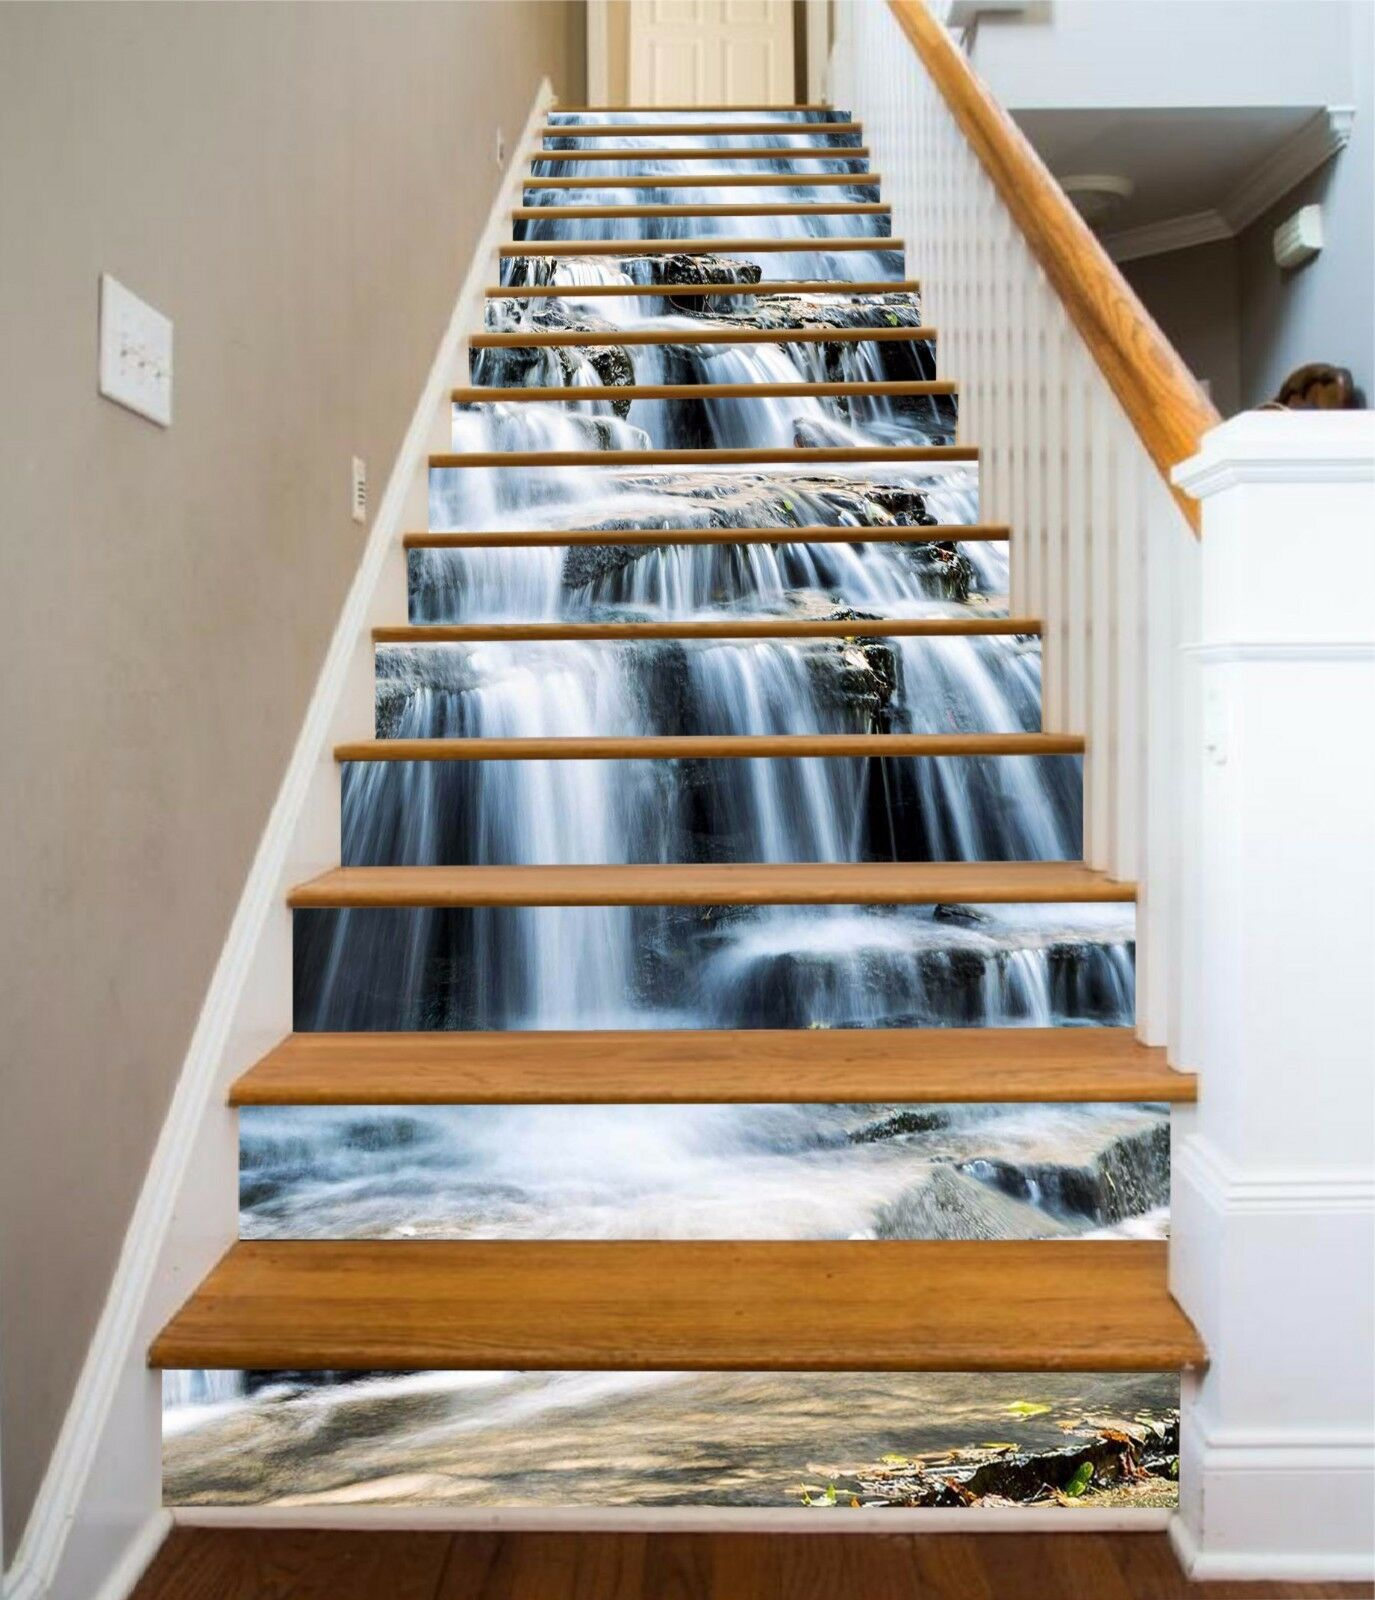 3D Falls Layer 794 Stair Risers Decoration Photo Mural Vinyl Decal Wallpaper AU